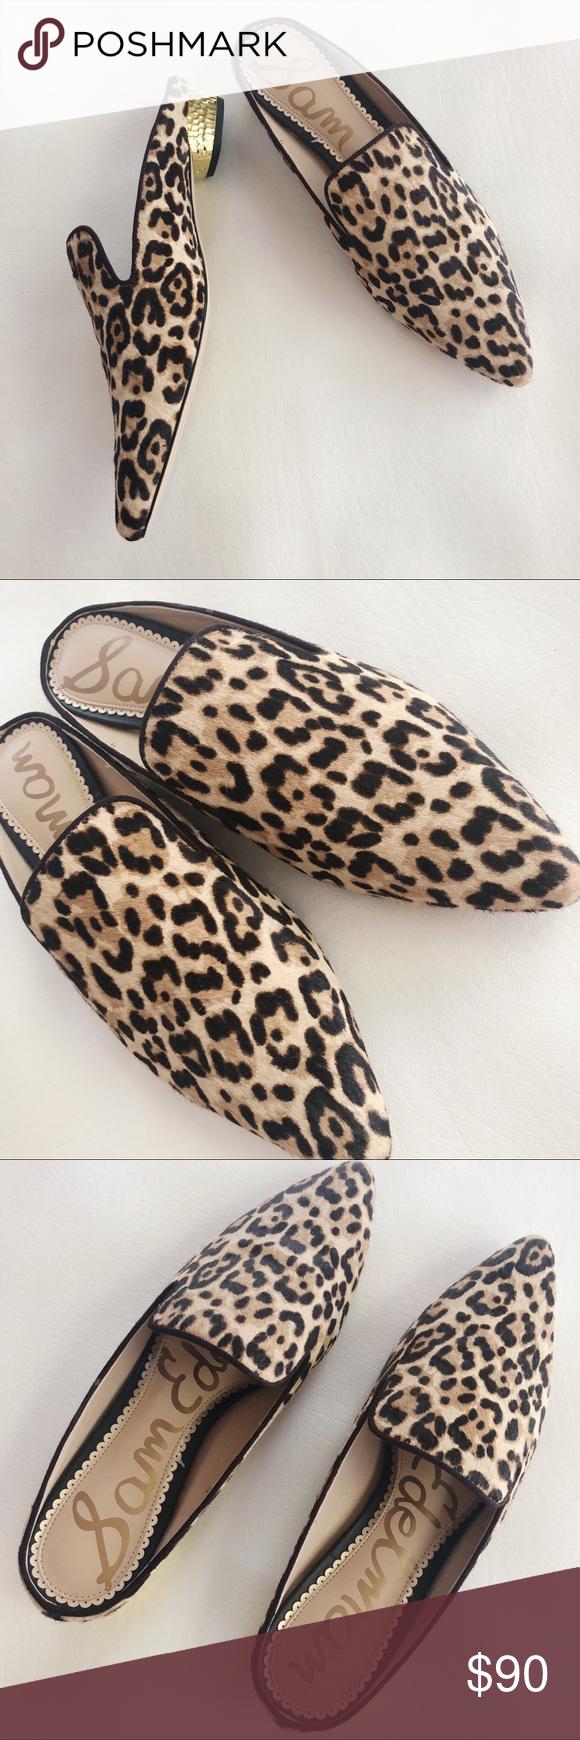 sam edelman leopard mule